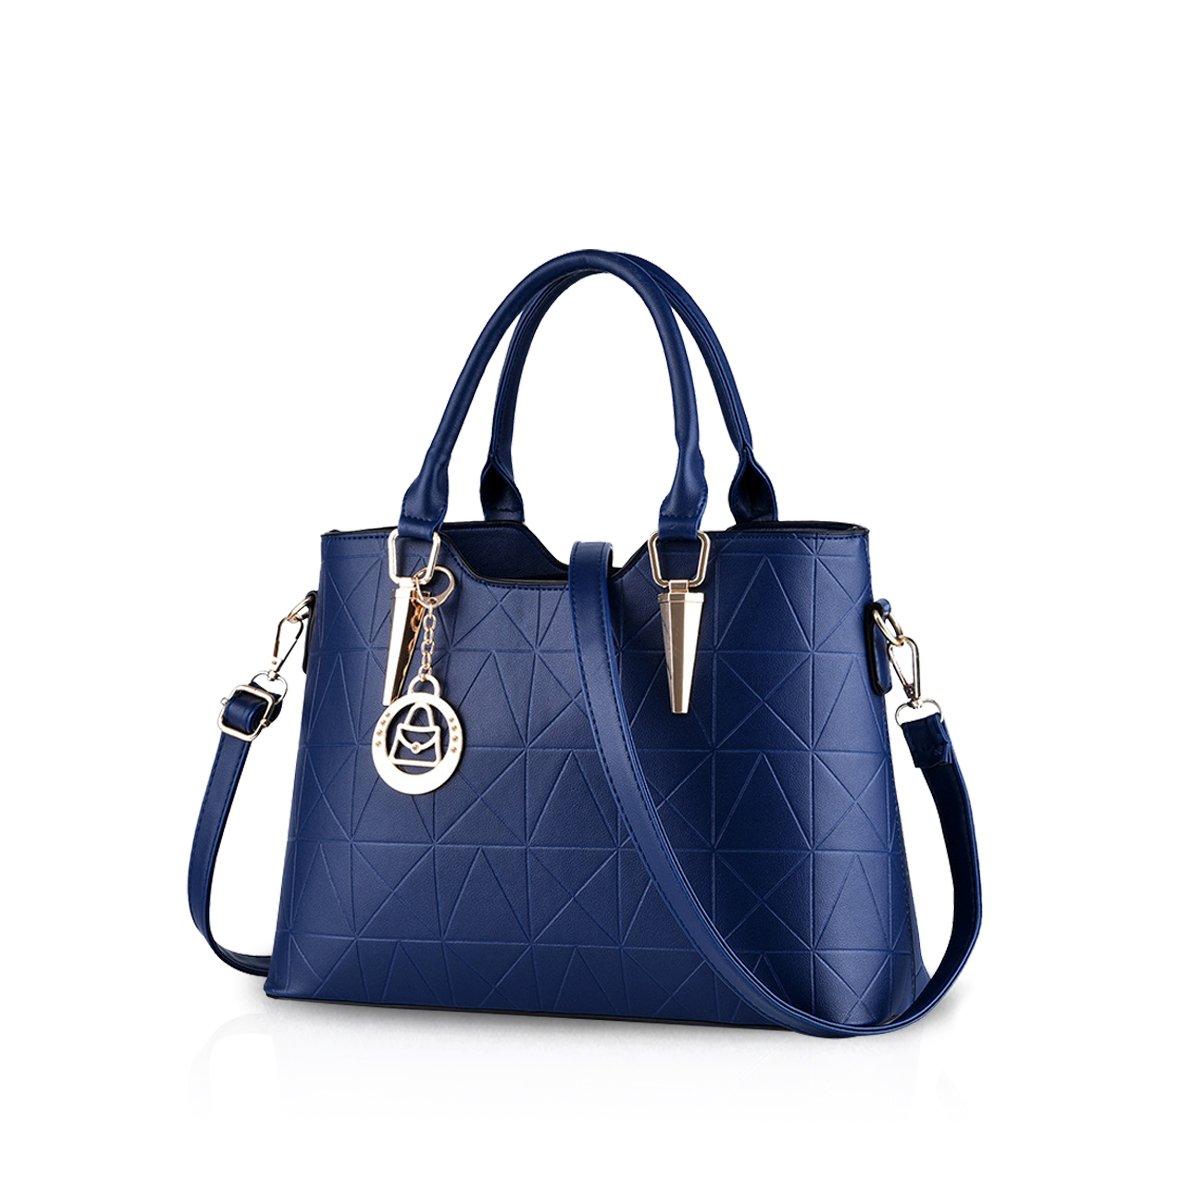 713cce0346a6 Nicole Doris 2016 new faishon style handbag casual shoulder bag cross-body  work bag purse for ladies(Sapphire)